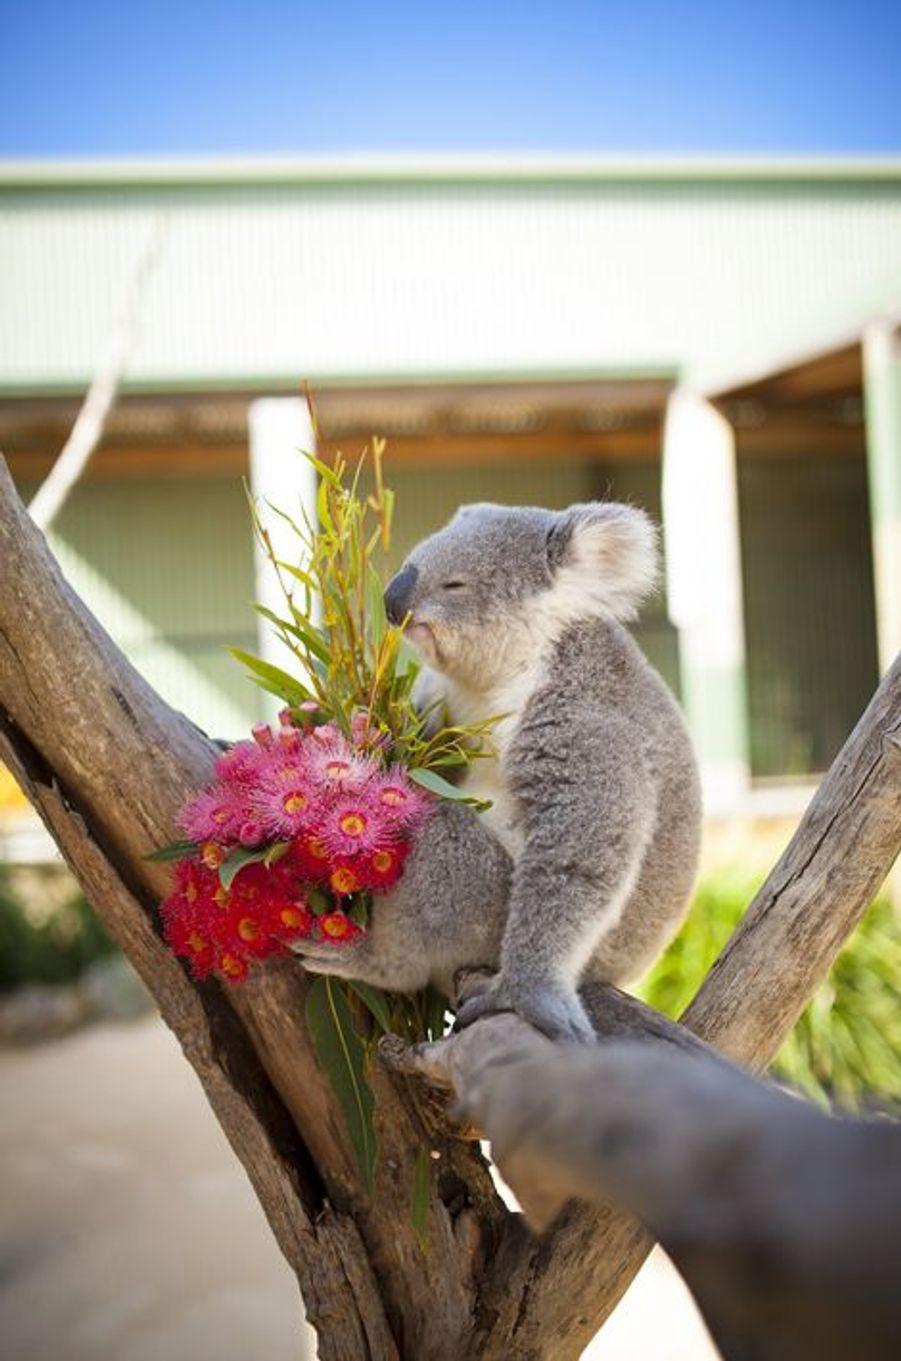 Imogen le koala fête la Saint-Valentin